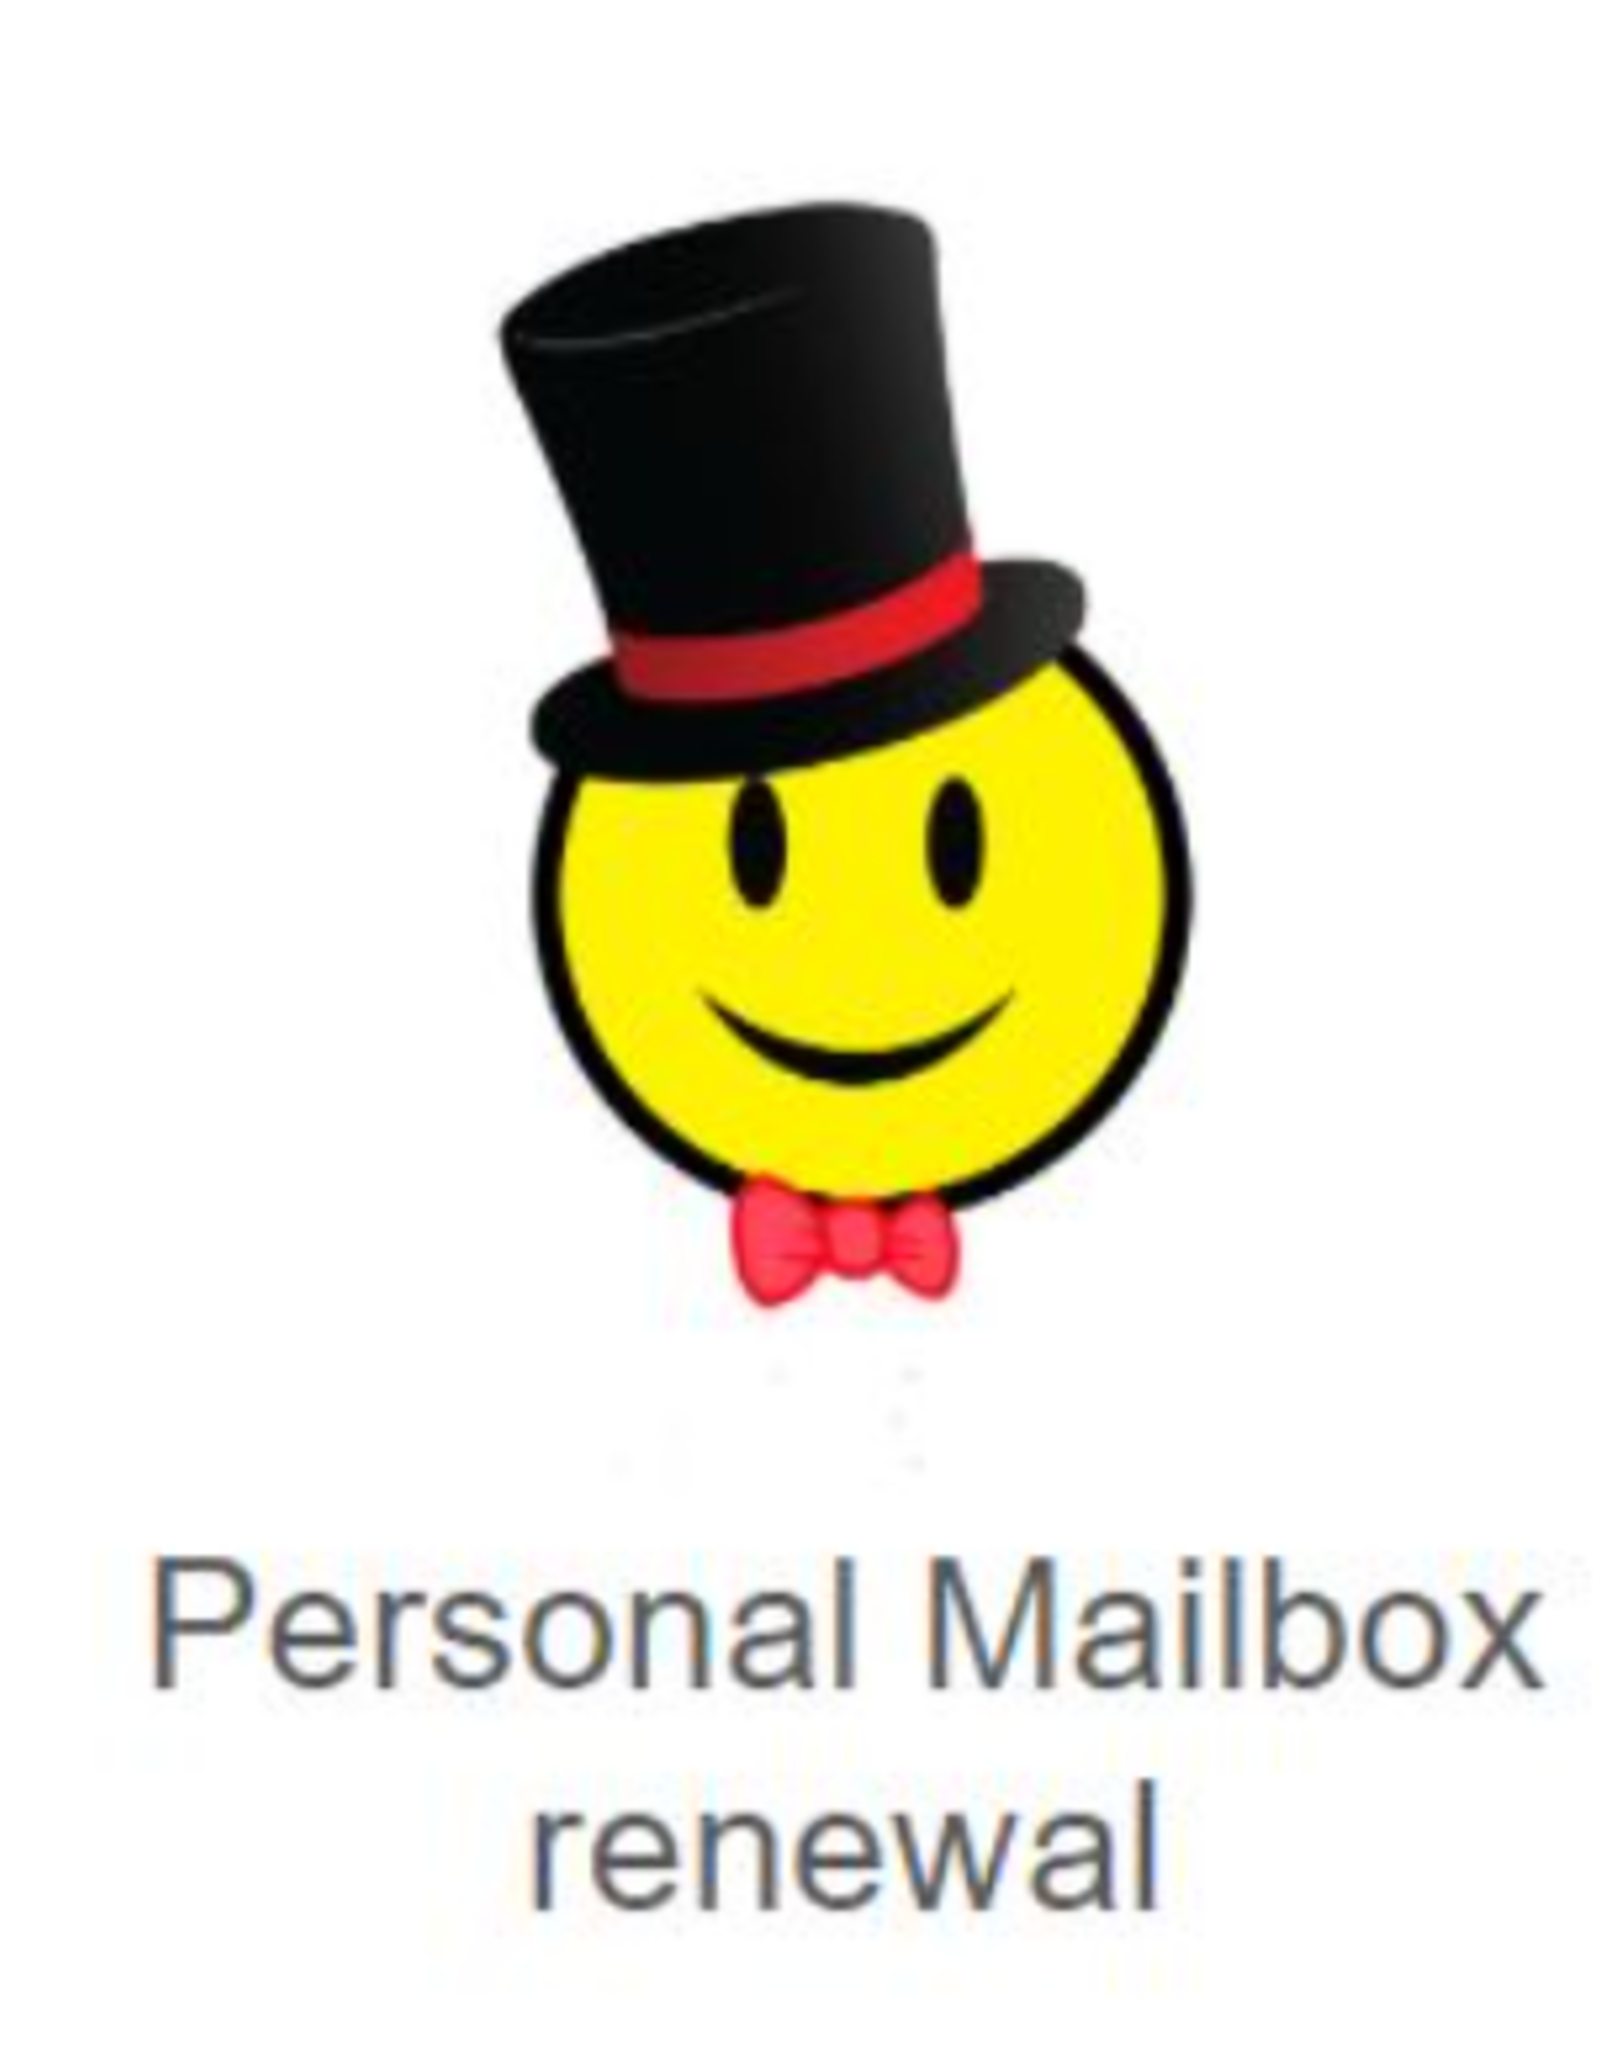 Postal Services - Mailbox 12 months